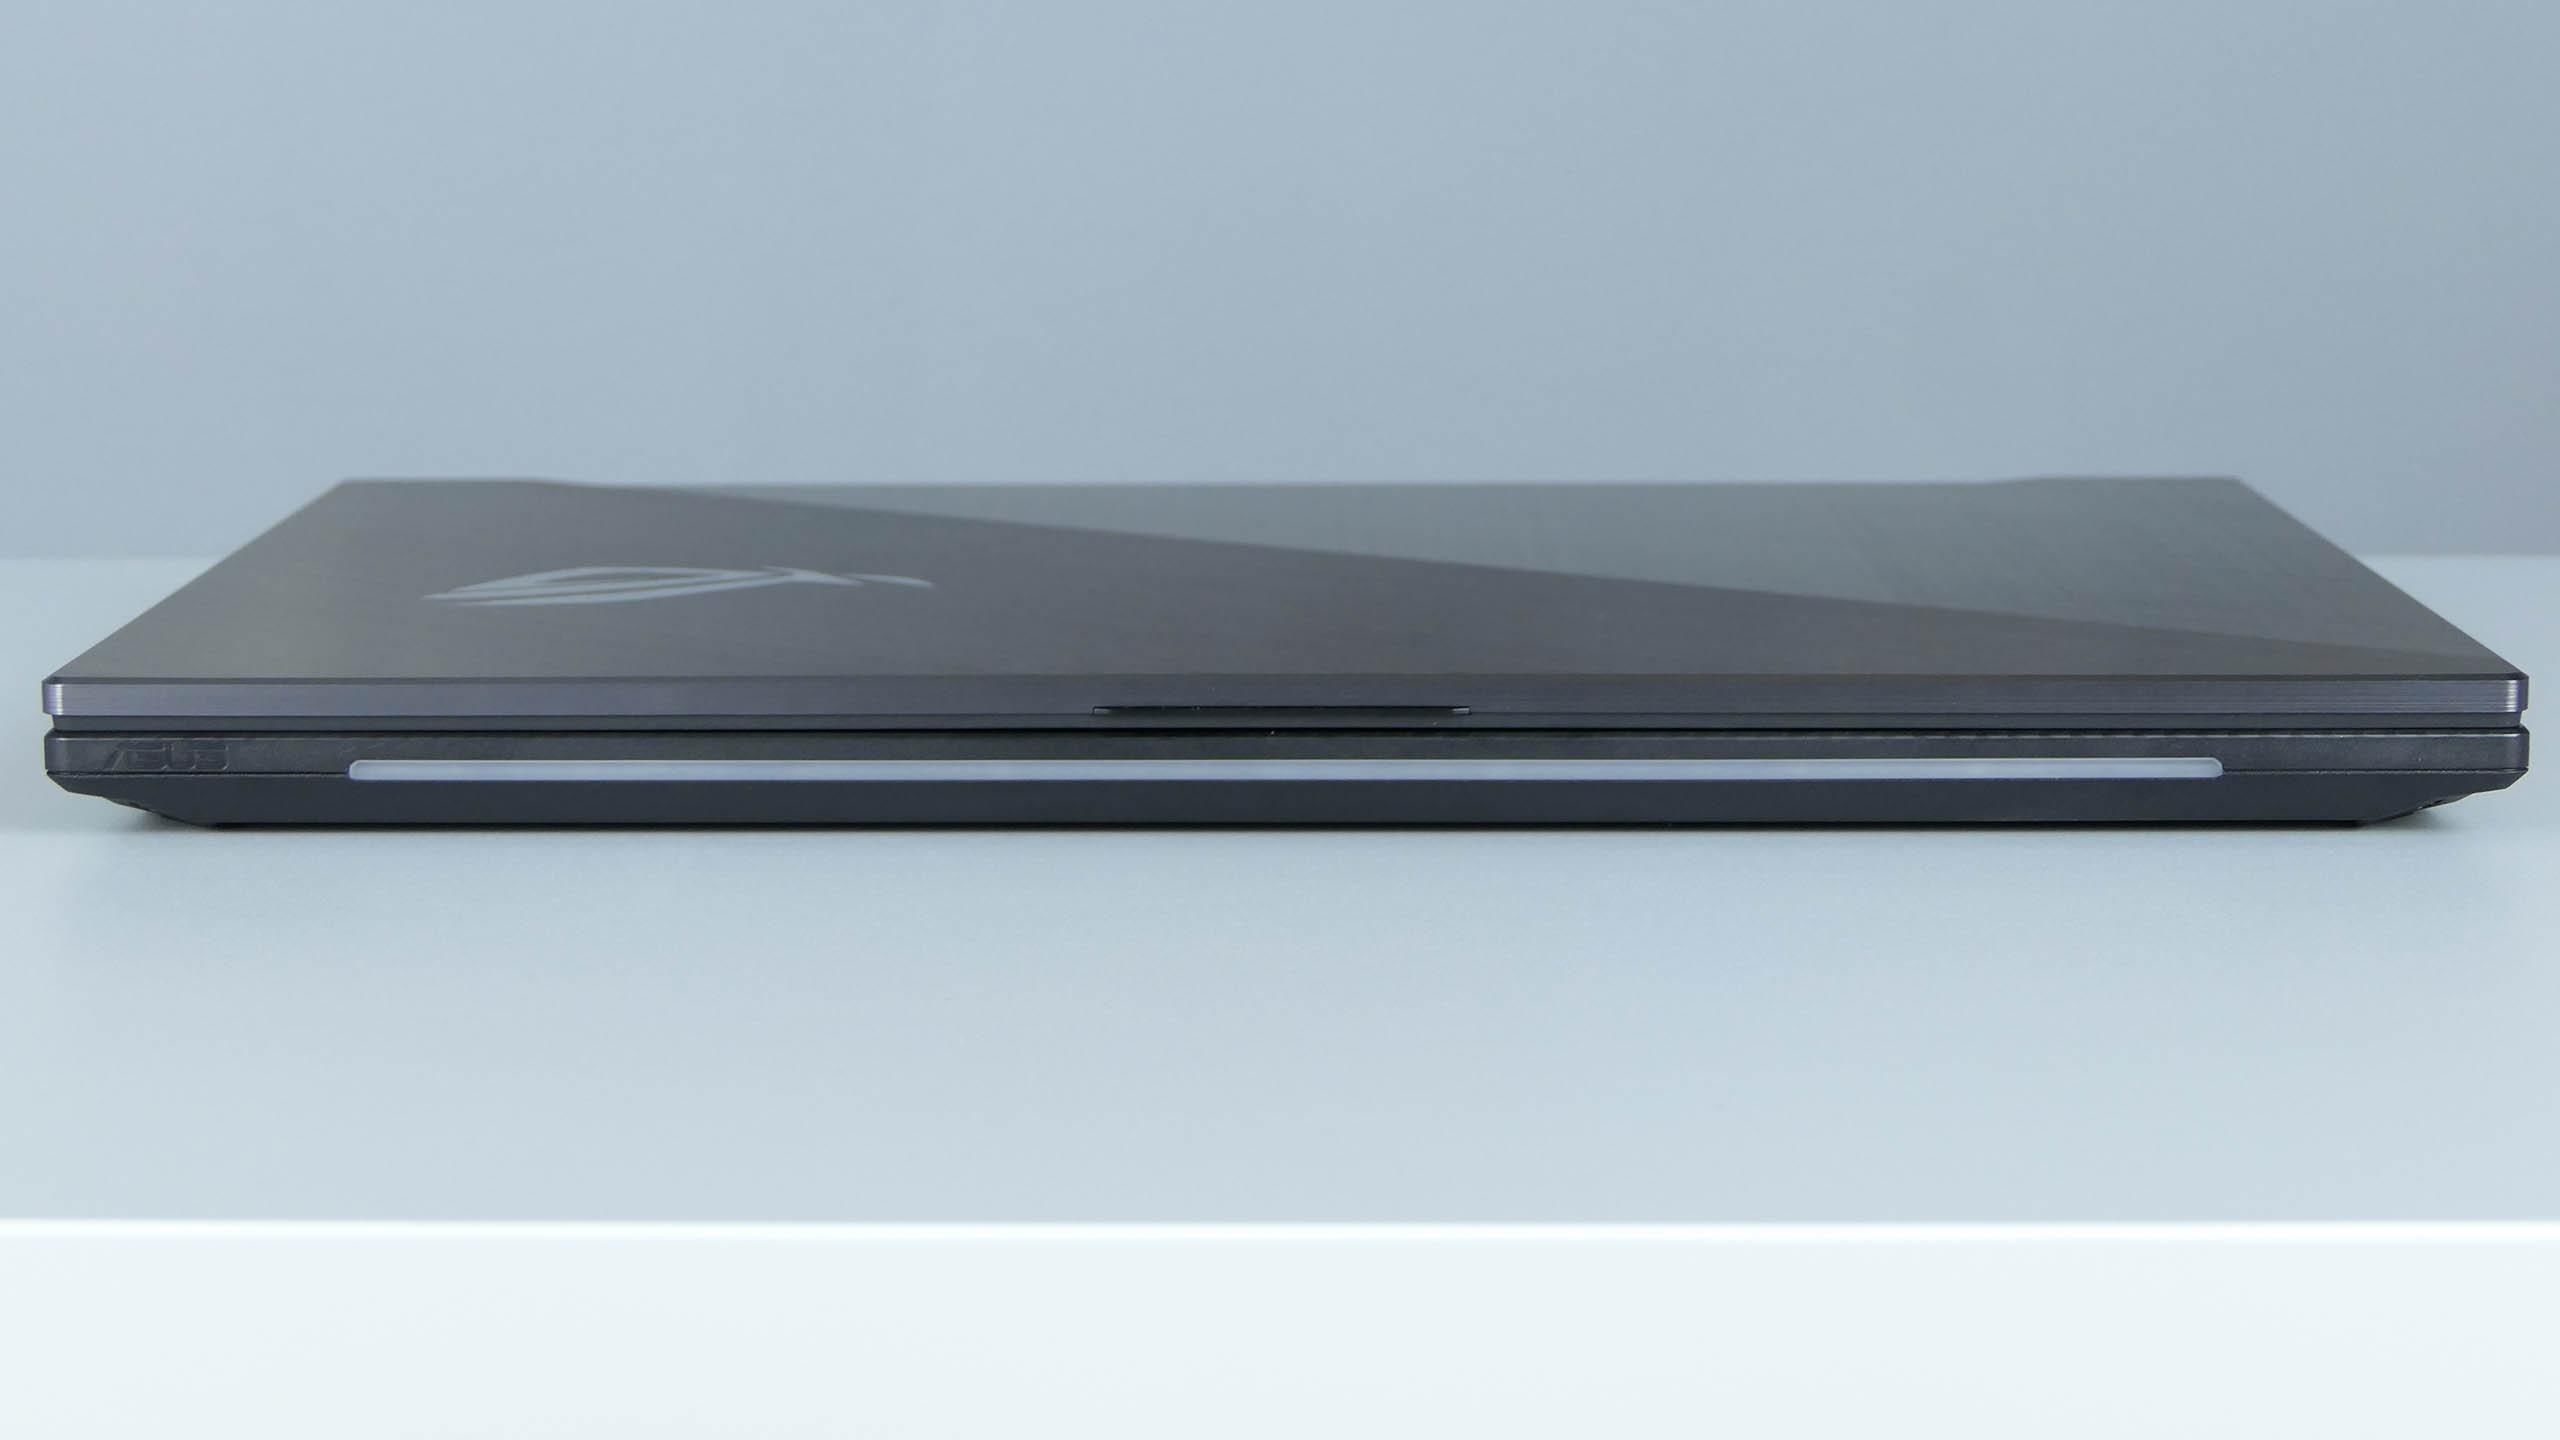 Asus ROG Strix Scar II GL704 - front notebooka